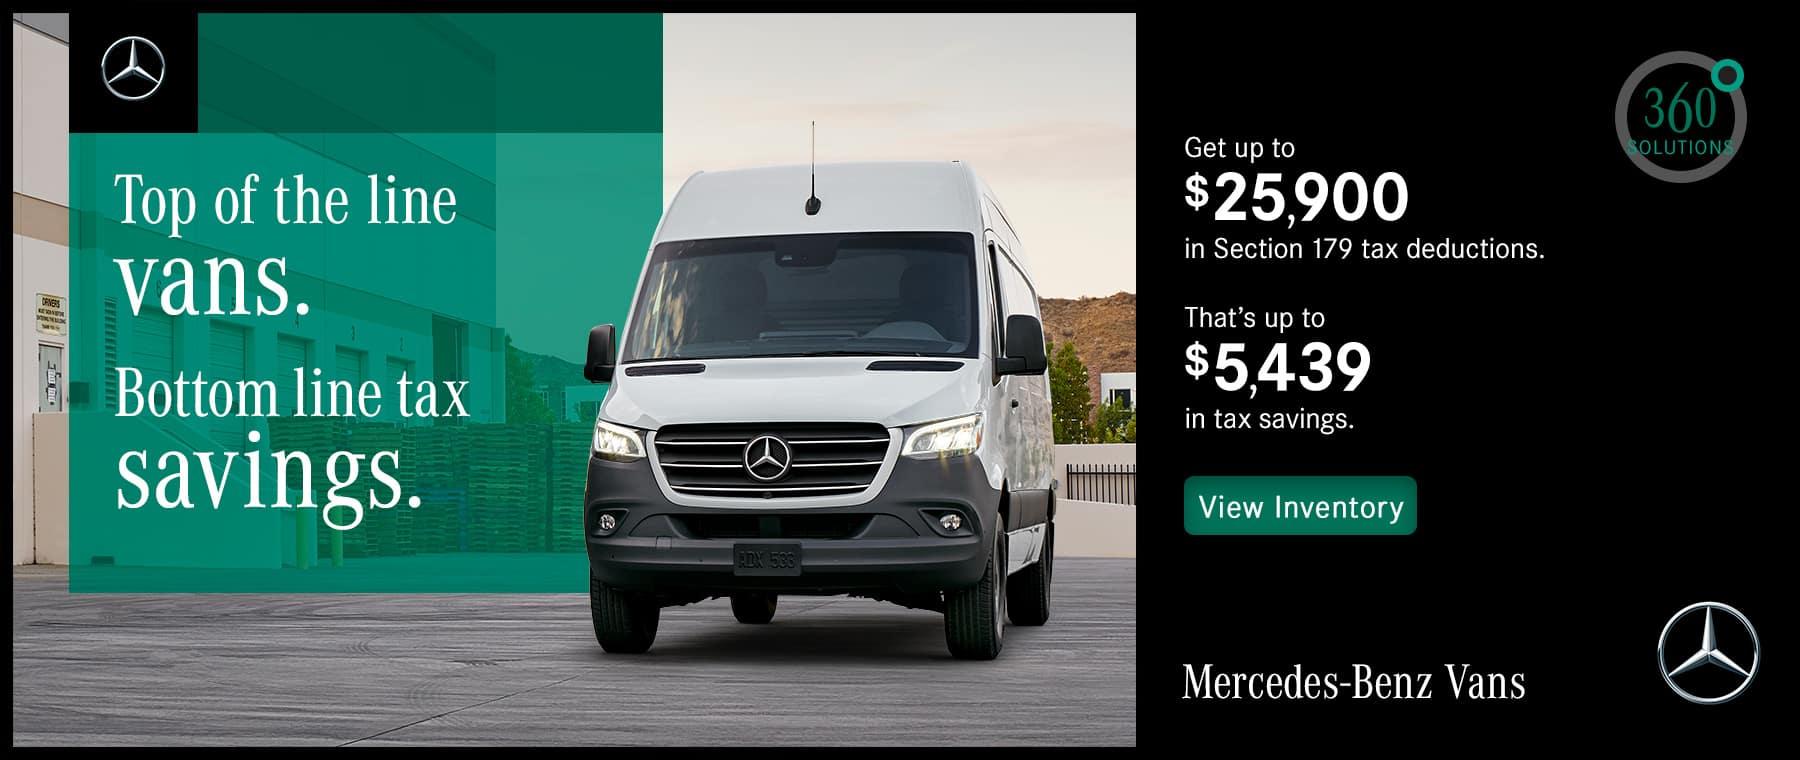 MB-Vans_Section-179_1800x760